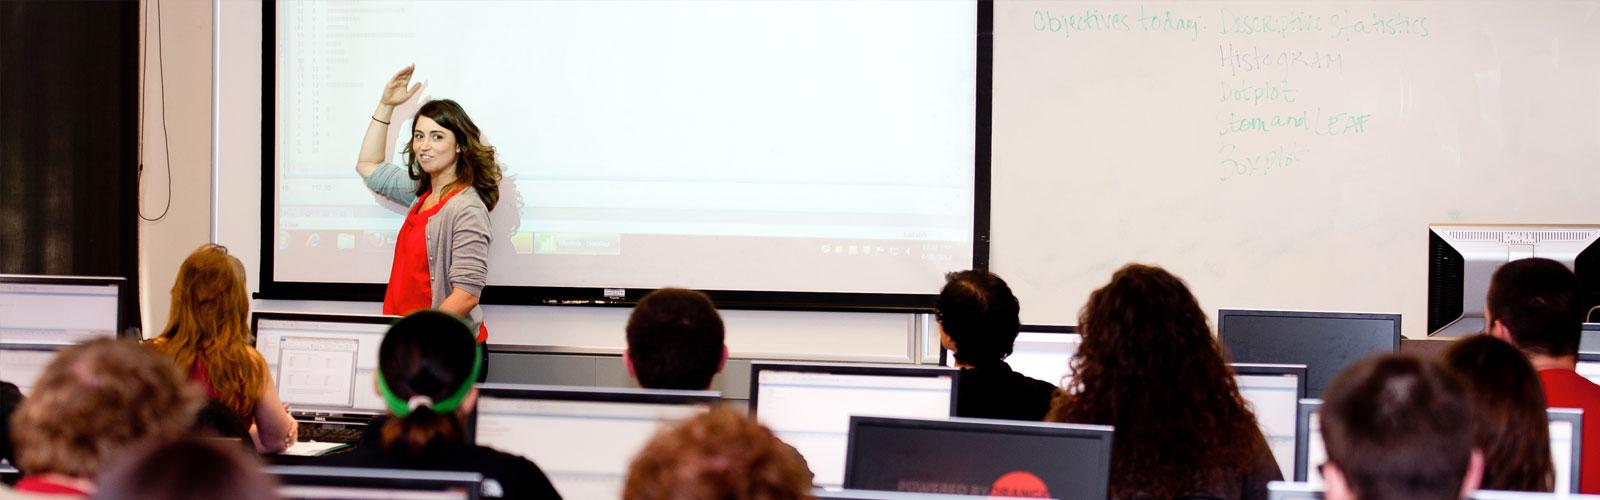 woman teaching large class